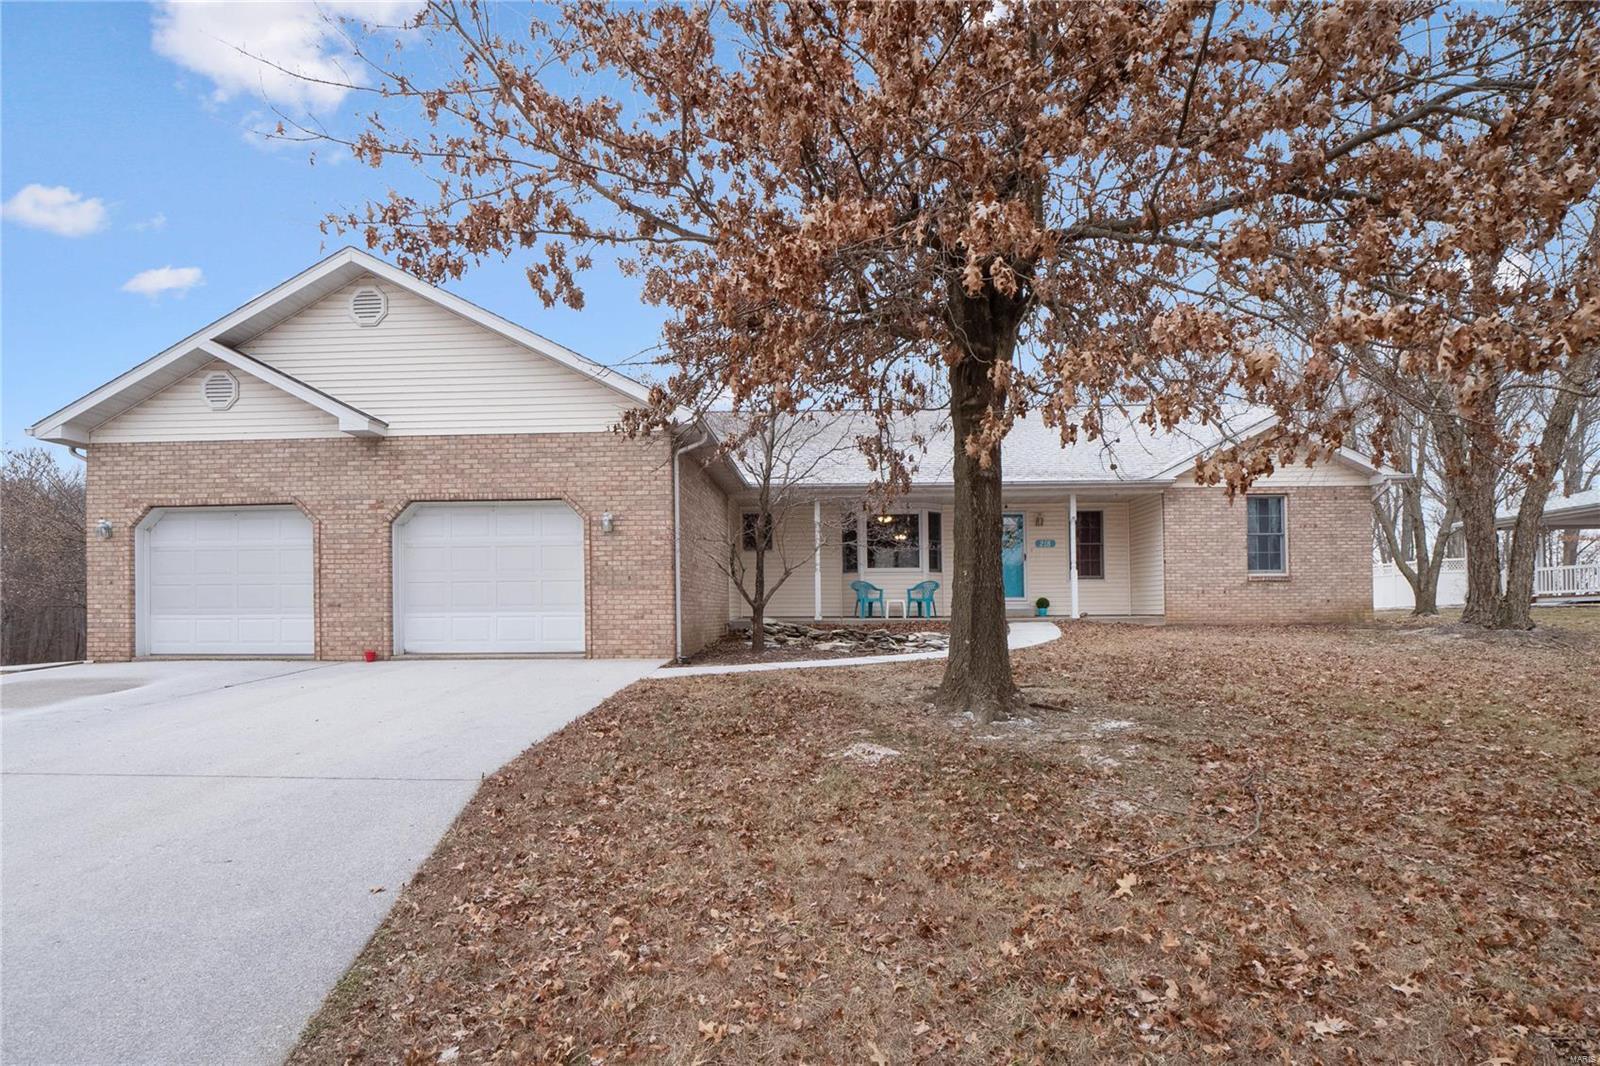 218 W Woodland Ridge Property Photo - Valmeyer, IL real estate listing